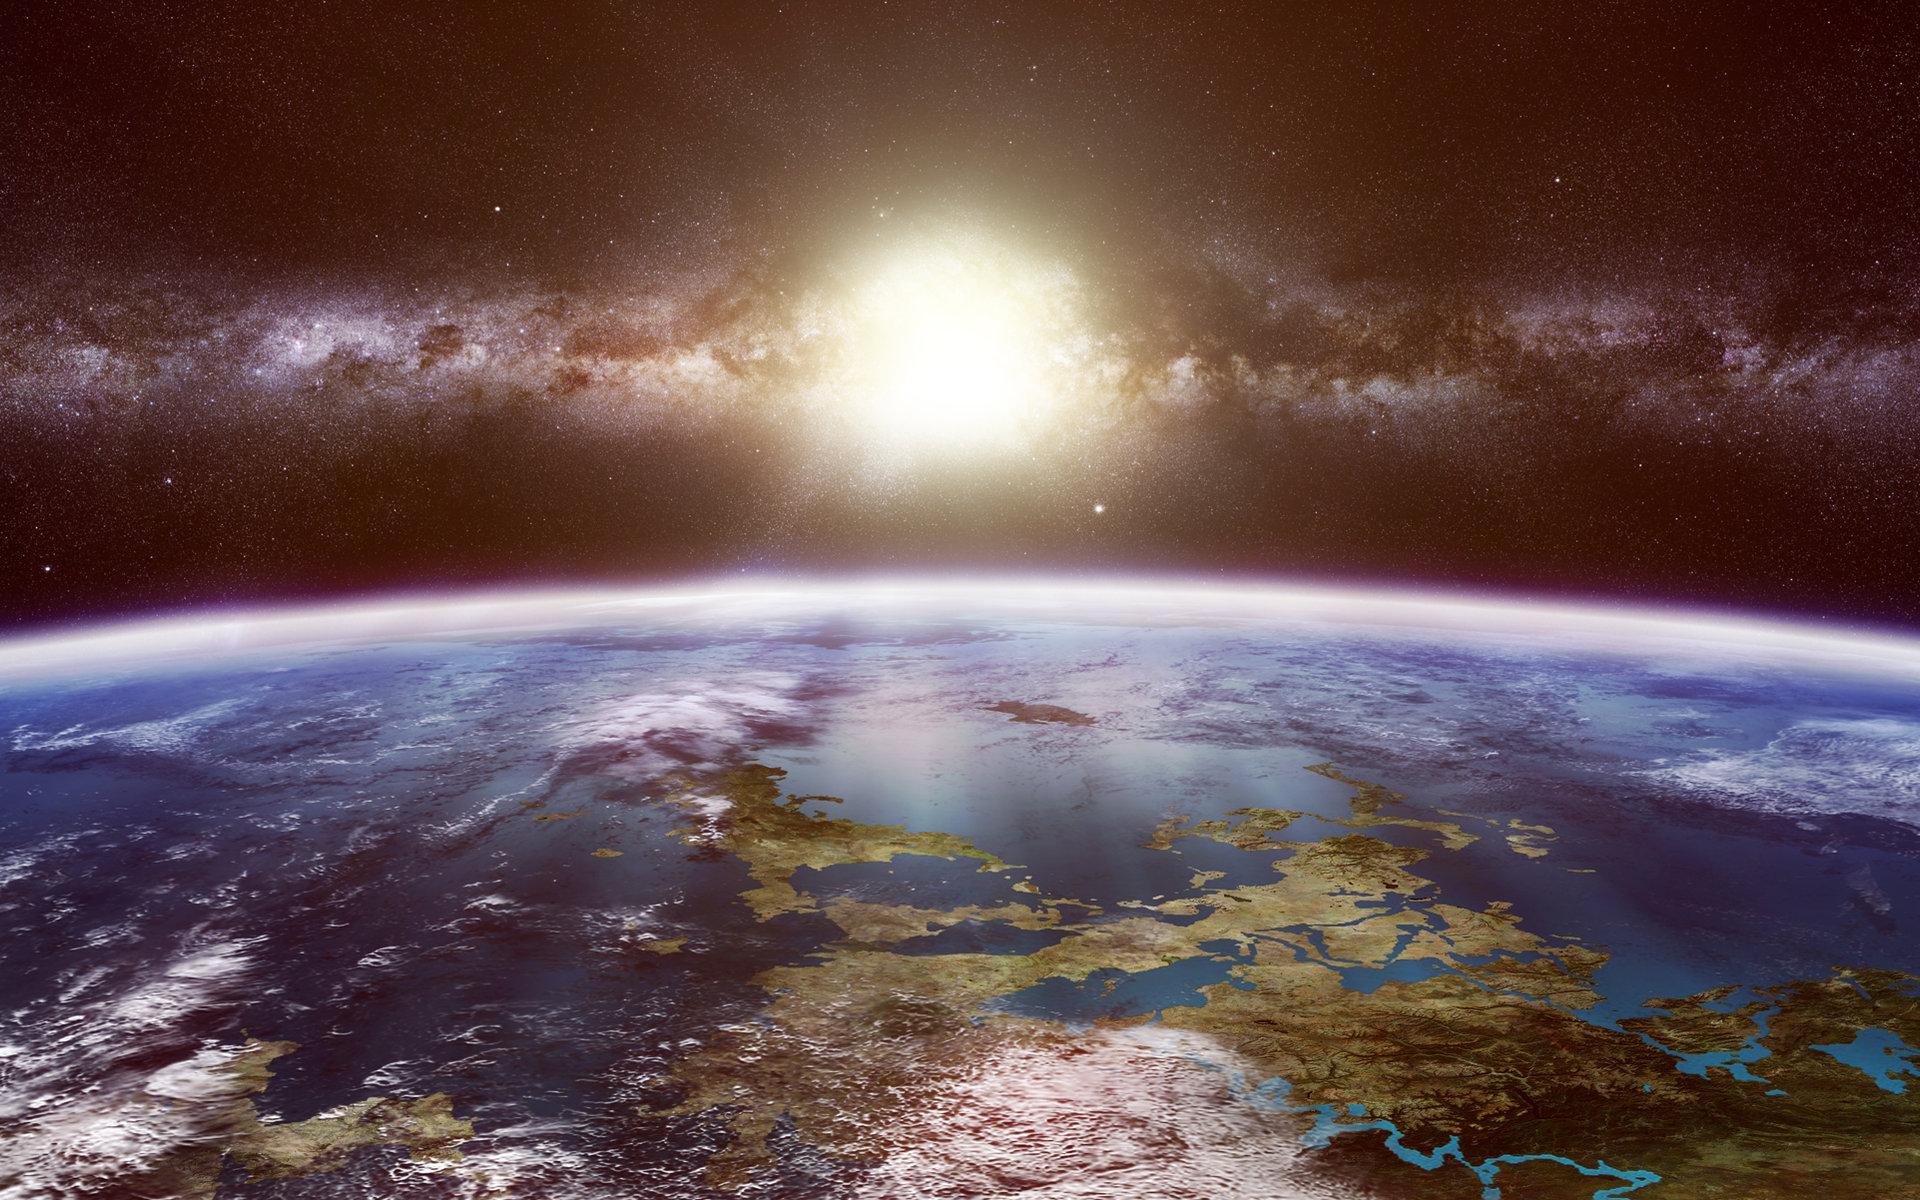 44 Planet Earth Desktop Wallpaper On Wallpapersafari